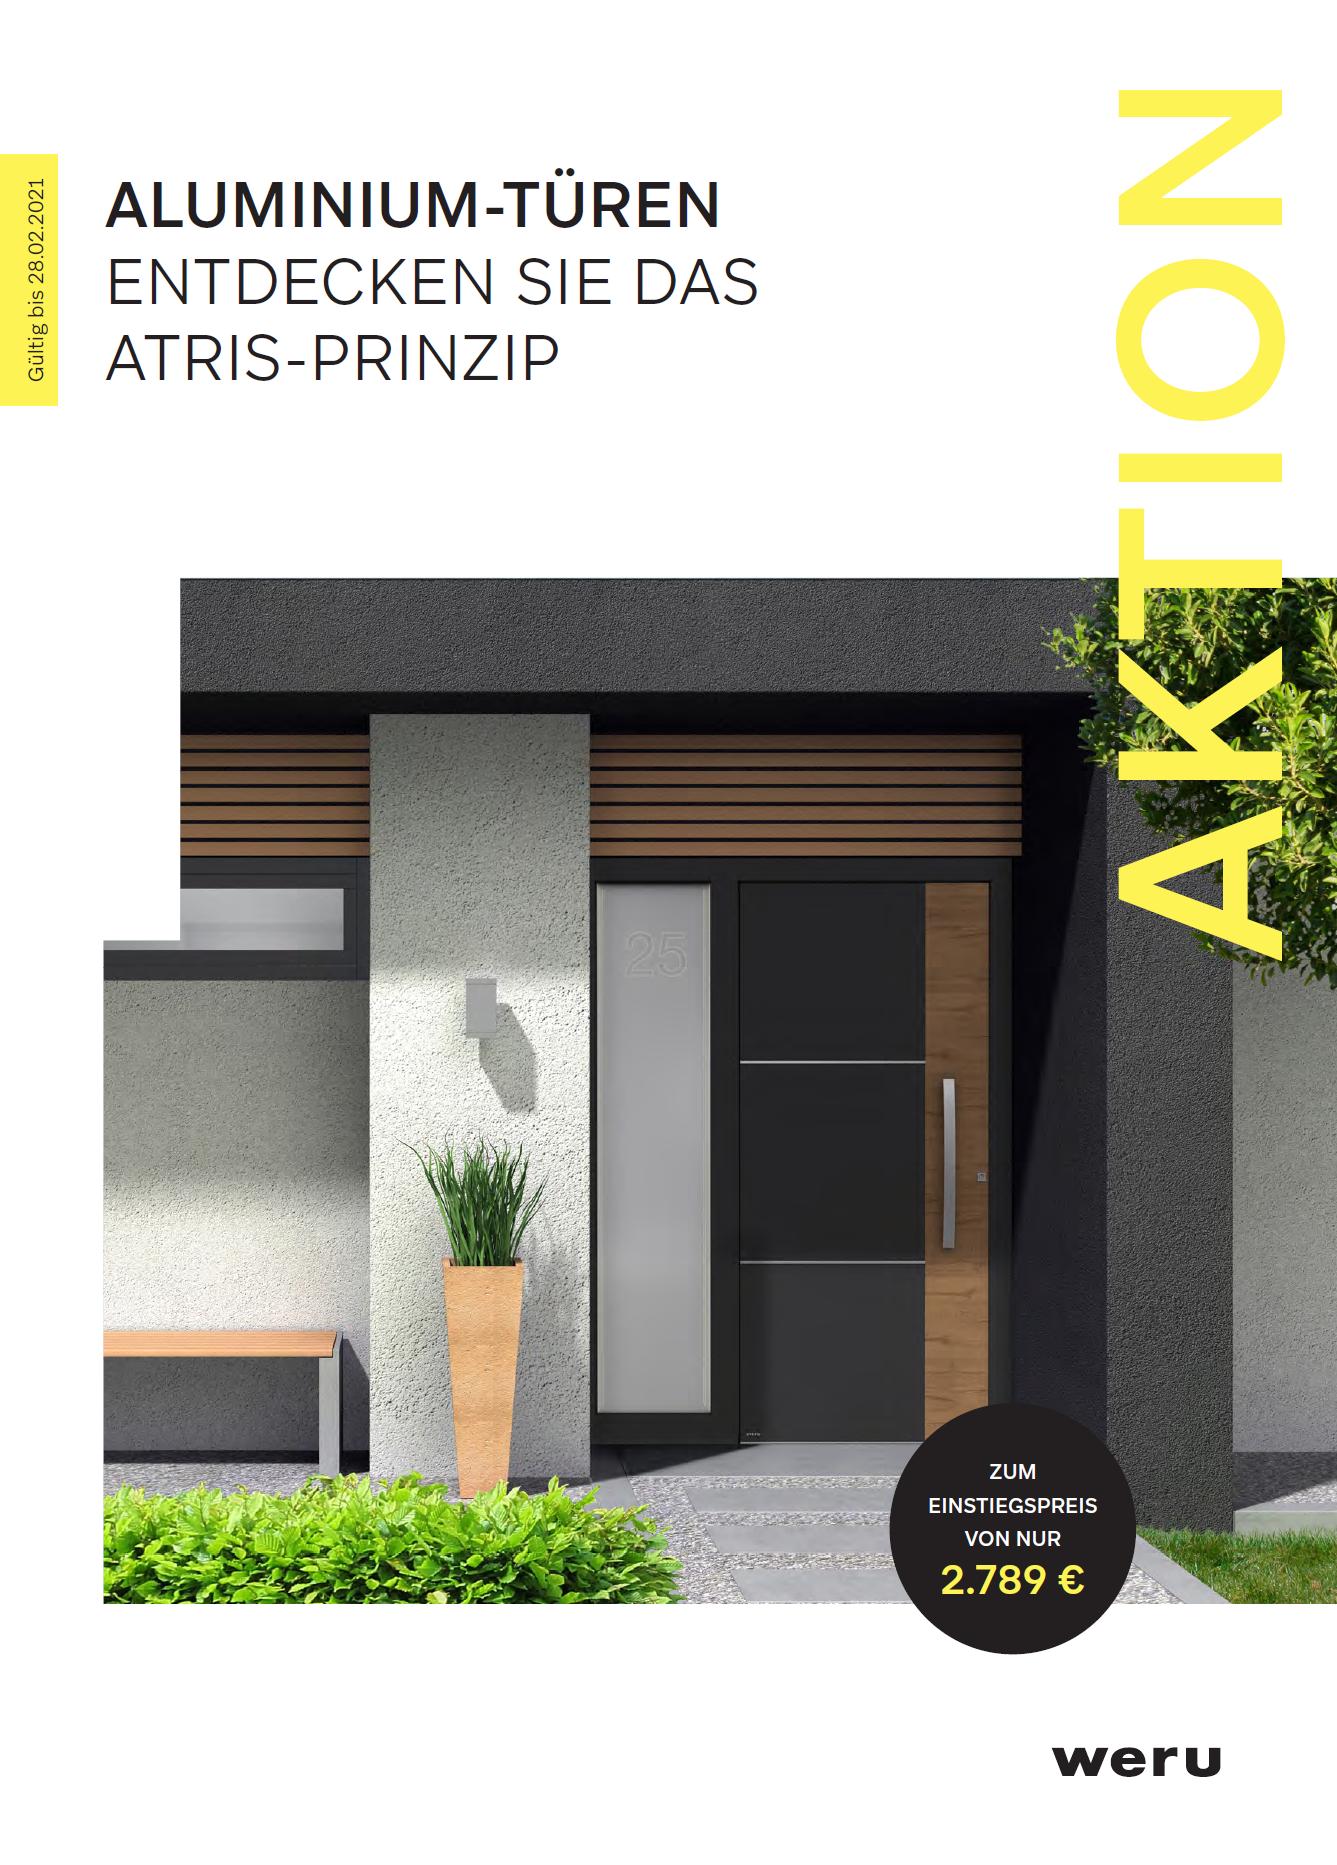 Aktion: Aluminium-Türen - Entdecken Sie das ATRIS-Prinzip